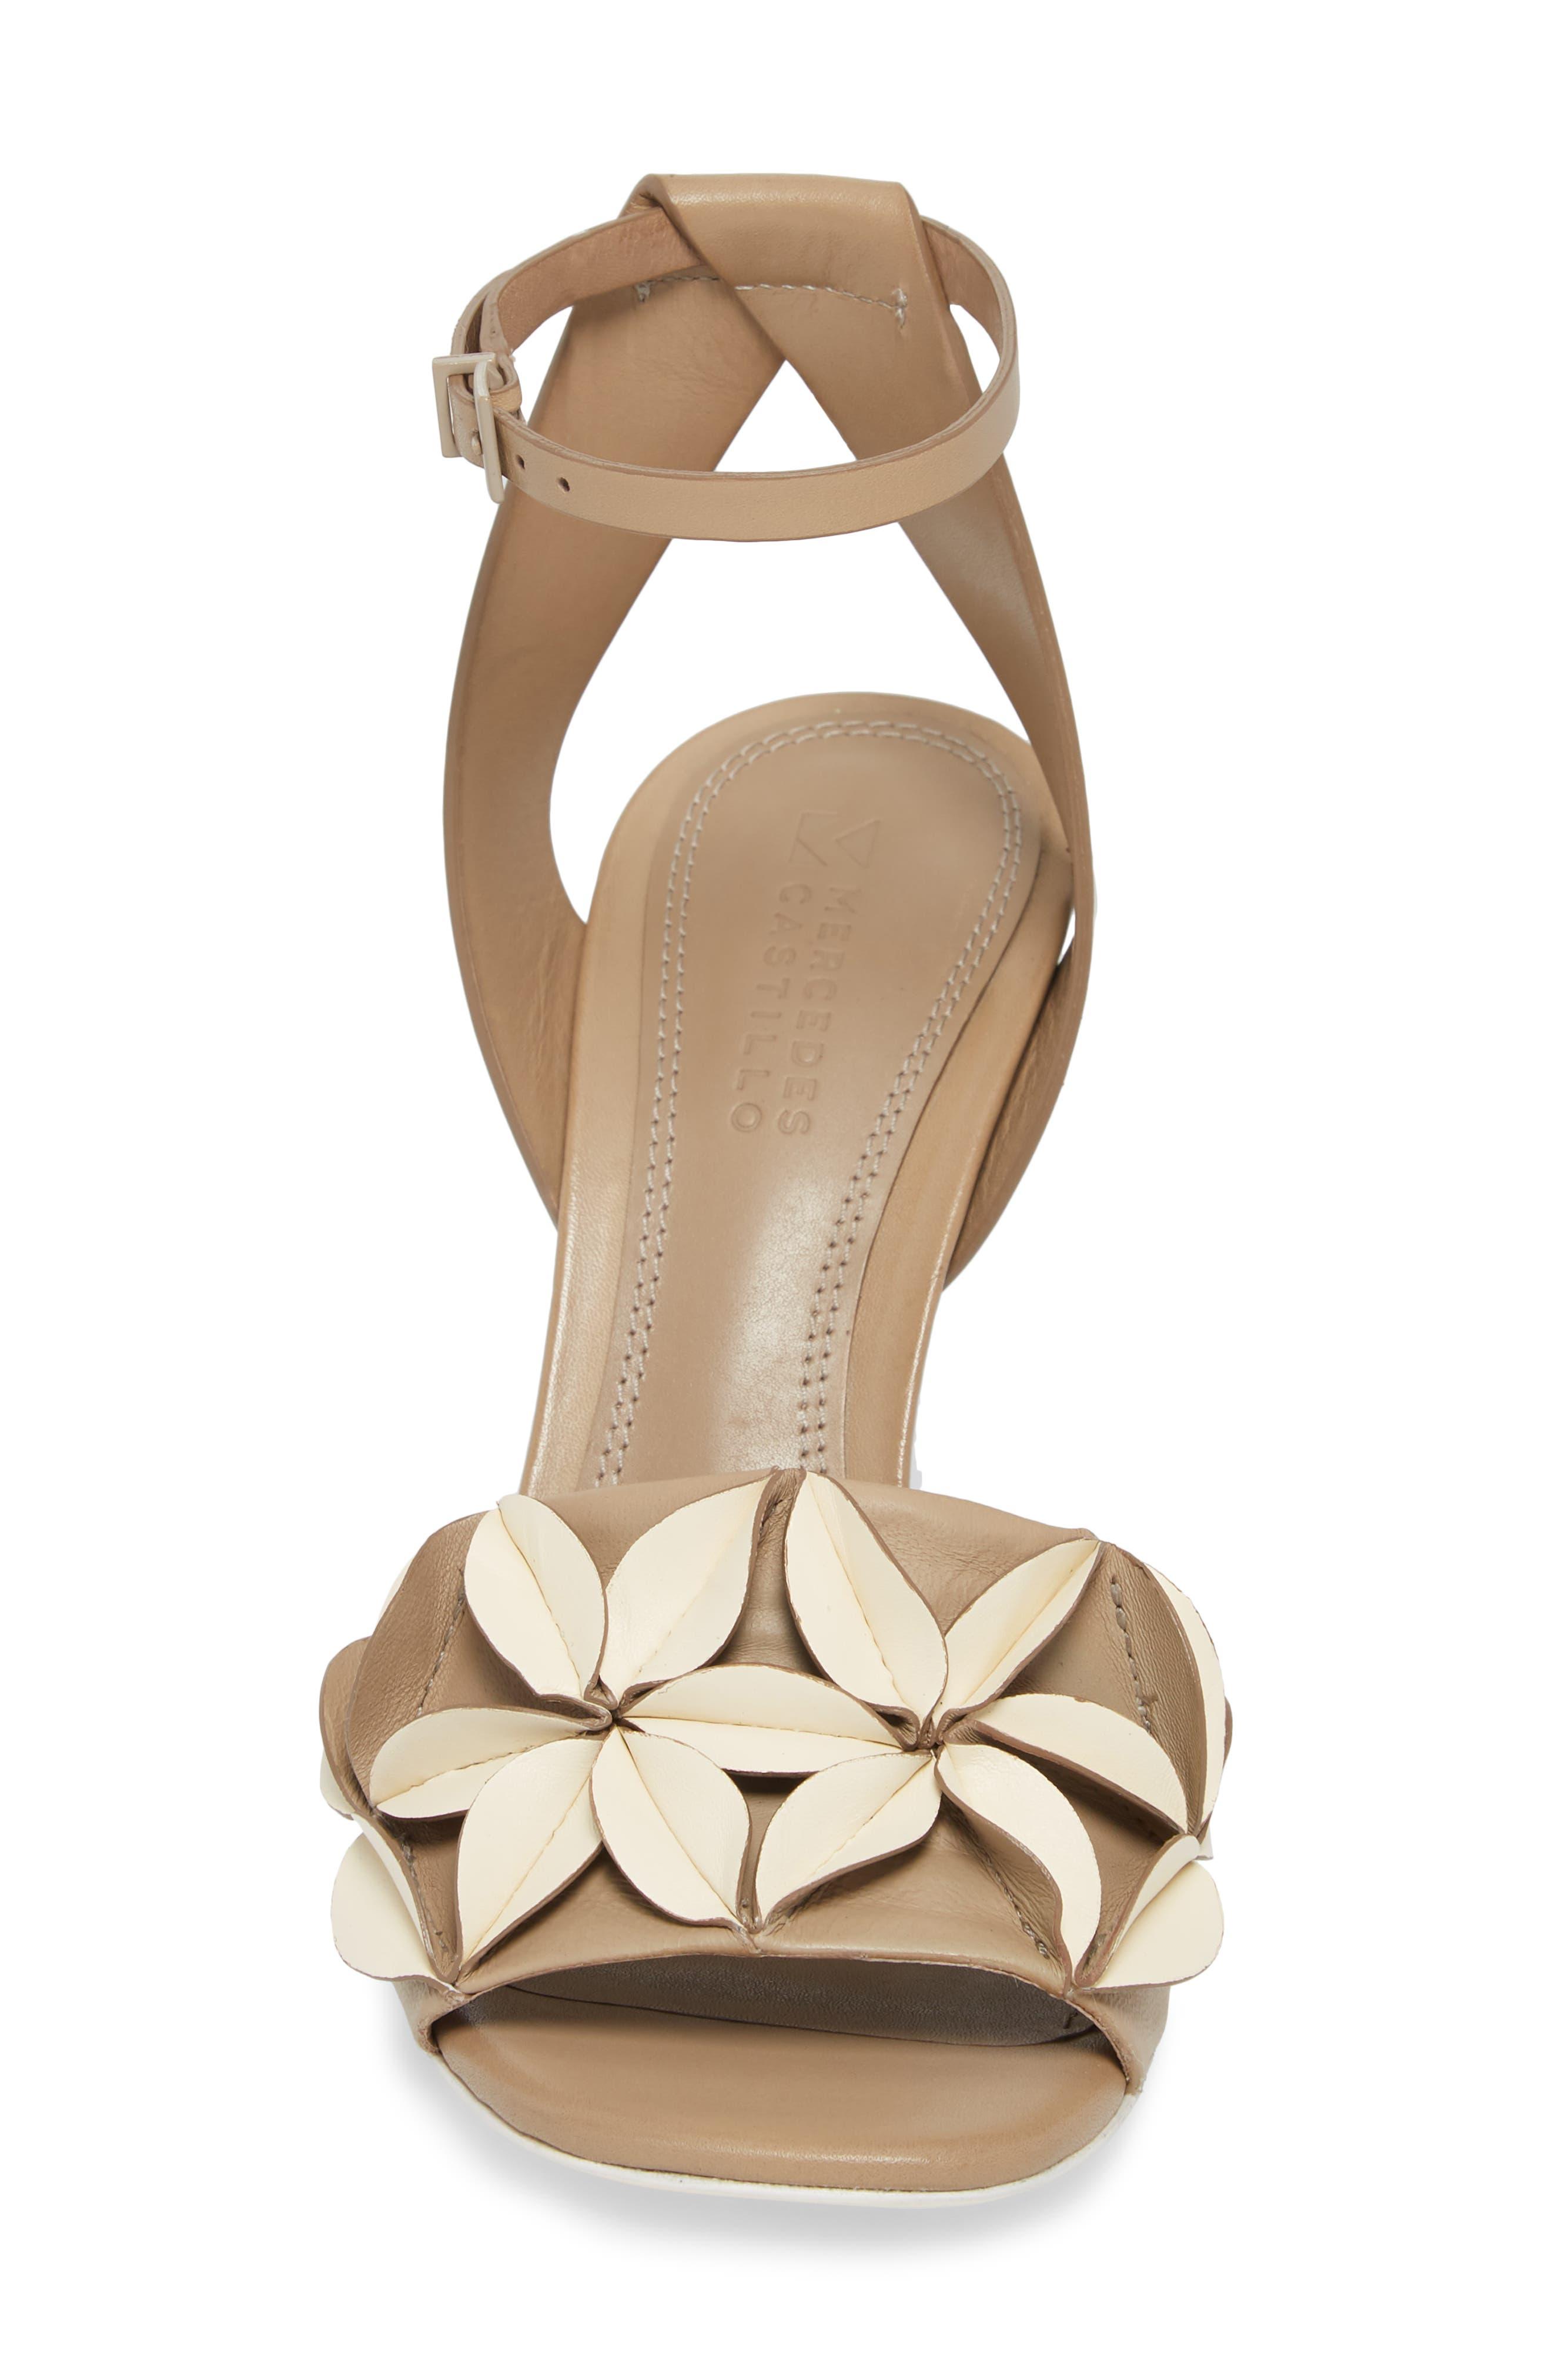 Milee Ankle Strap Sandal,                             Alternate thumbnail 4, color,                             250